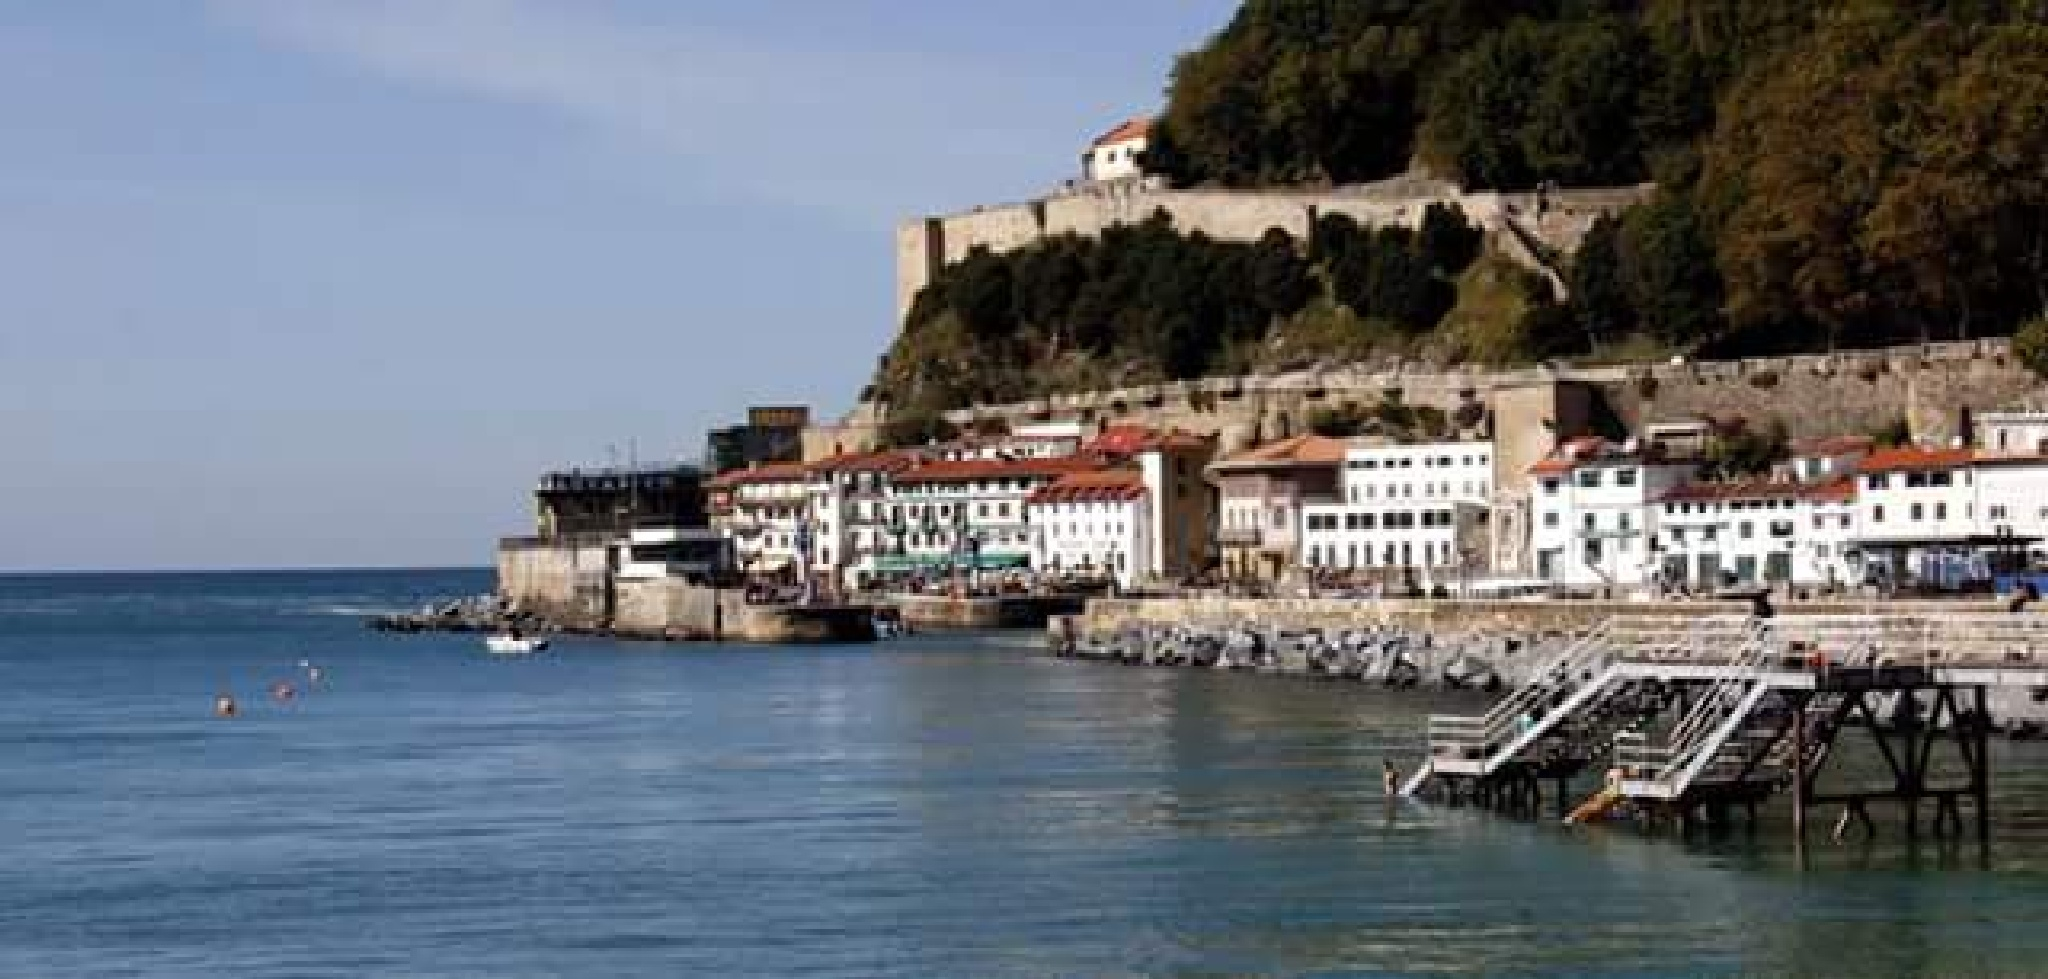 San Sebastian coast by thierrylorenzo